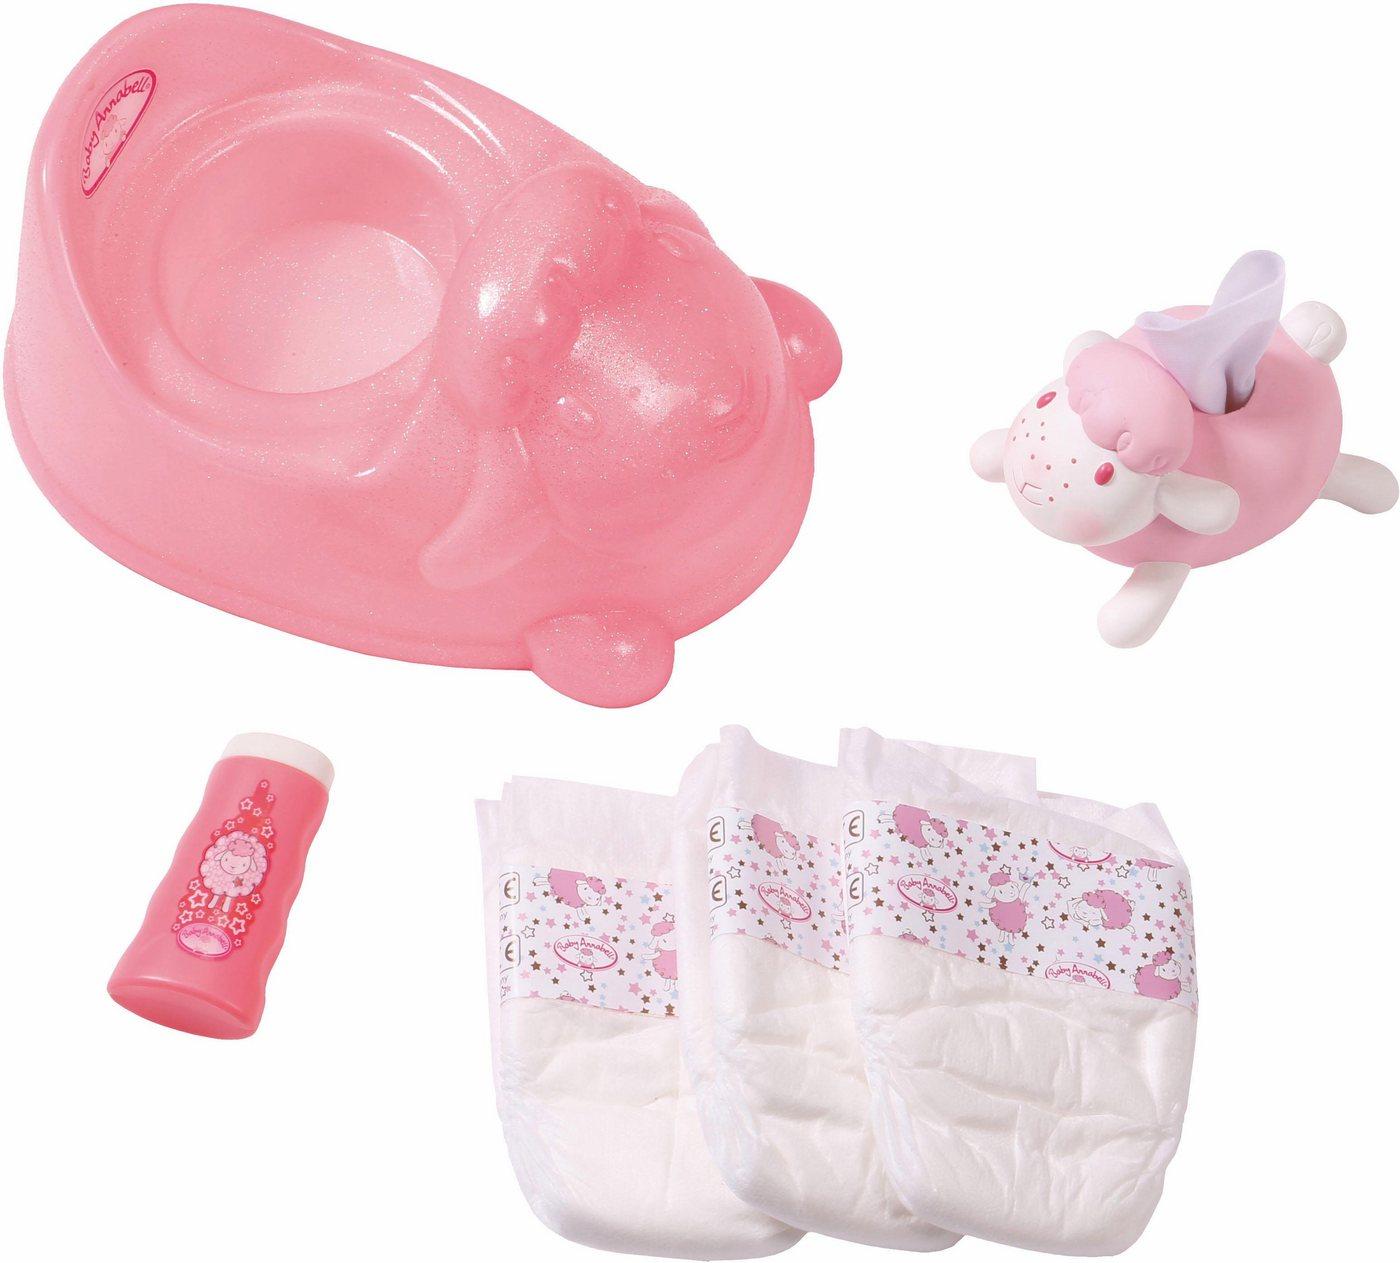 unisex Zapf Creation® Puppen Töpfchen »Baby Annabell® Training Set« rosa  Puppen & Zubehoer